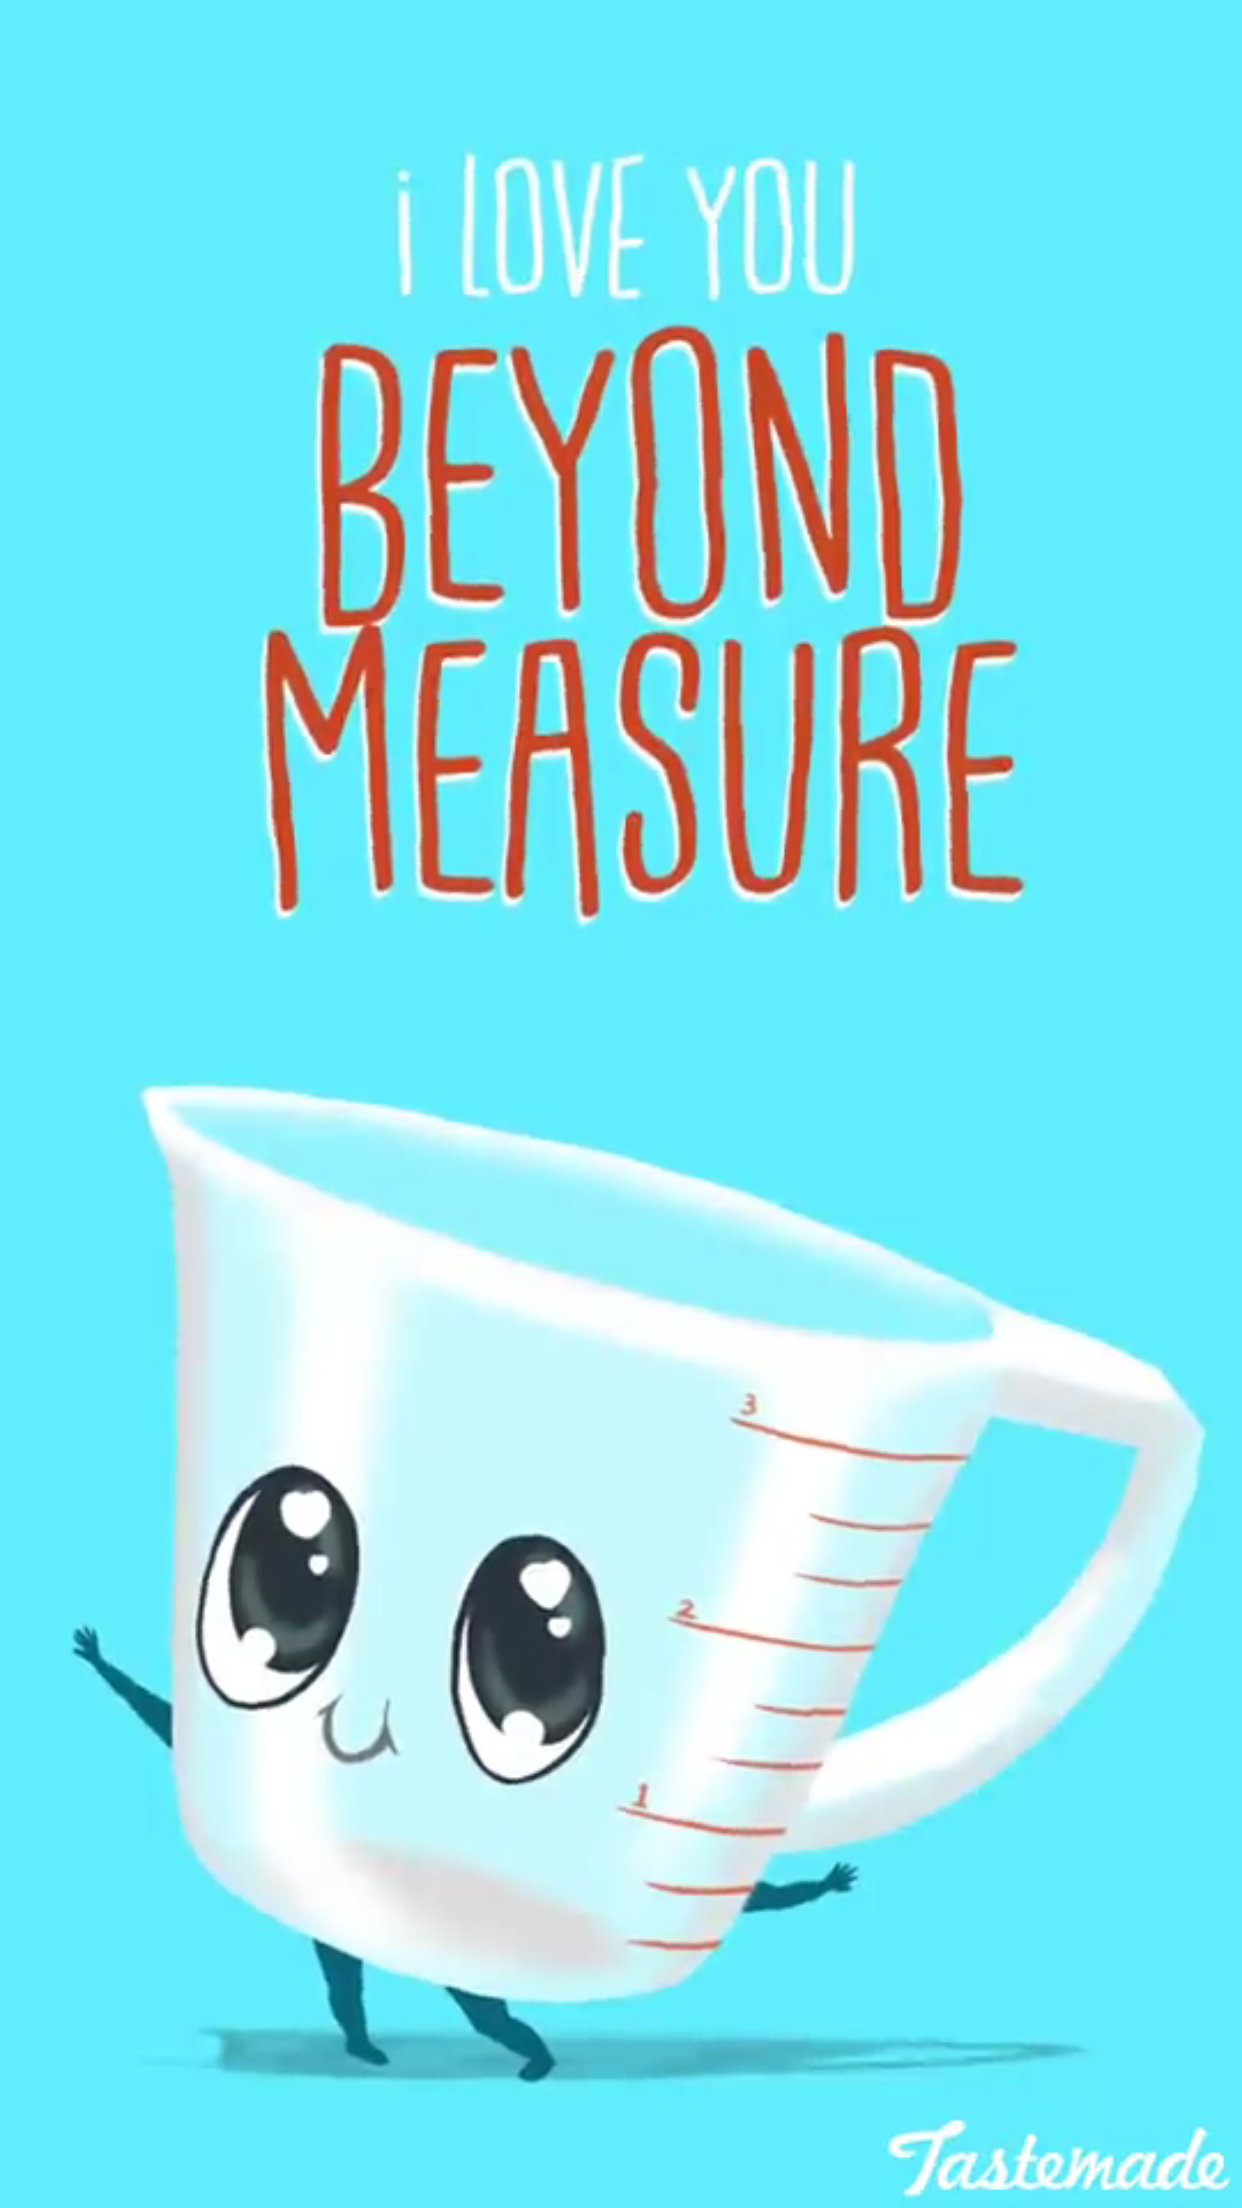 I love you beyond measure | emergency: make someone smile ...